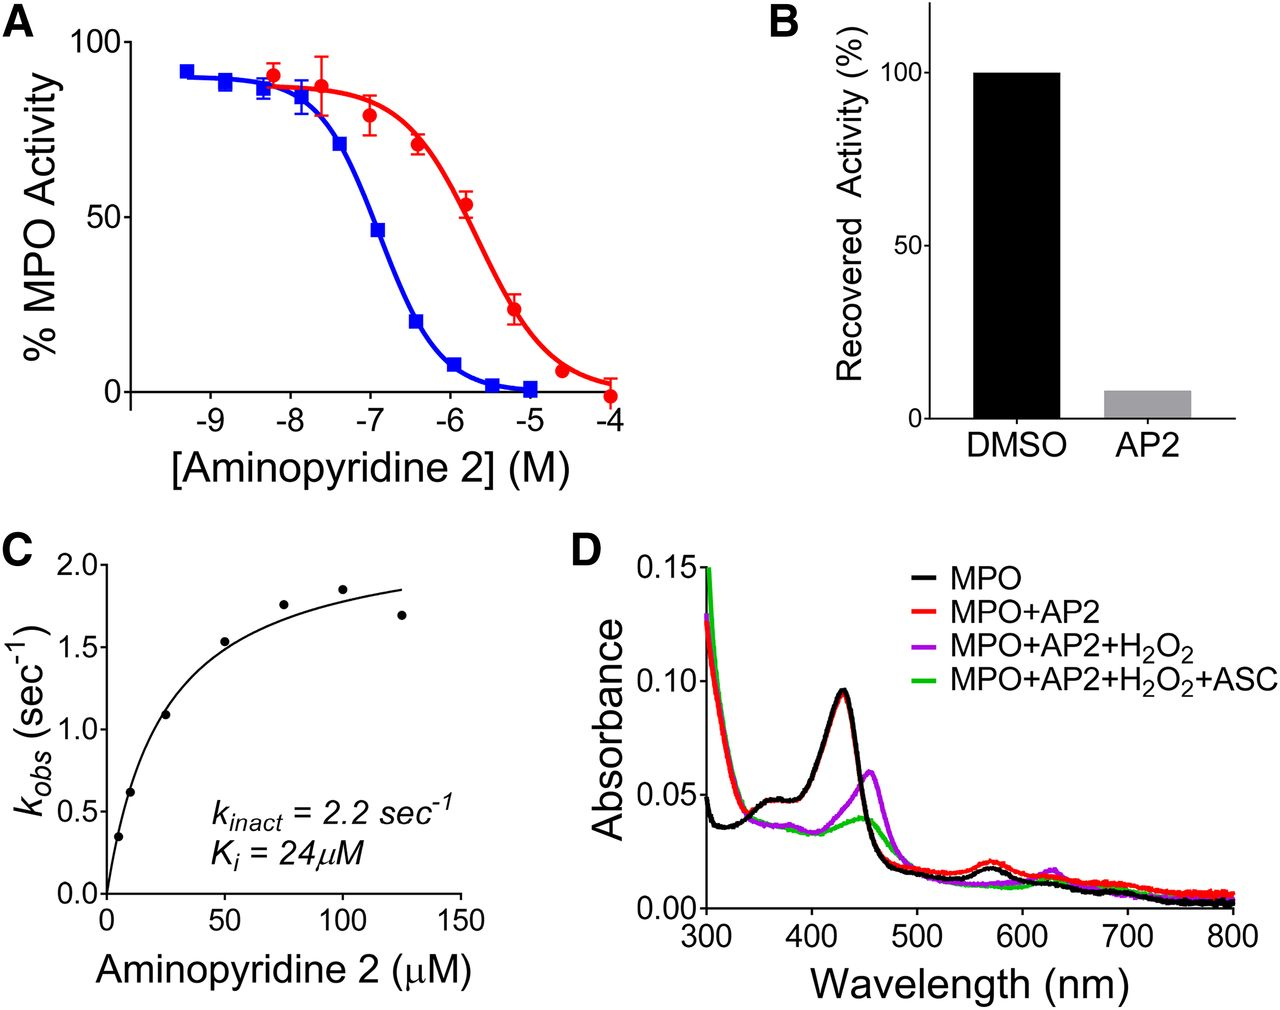 Discovery of 1-((6-Aminopyridin-3-yl)Methyl)-3-(4